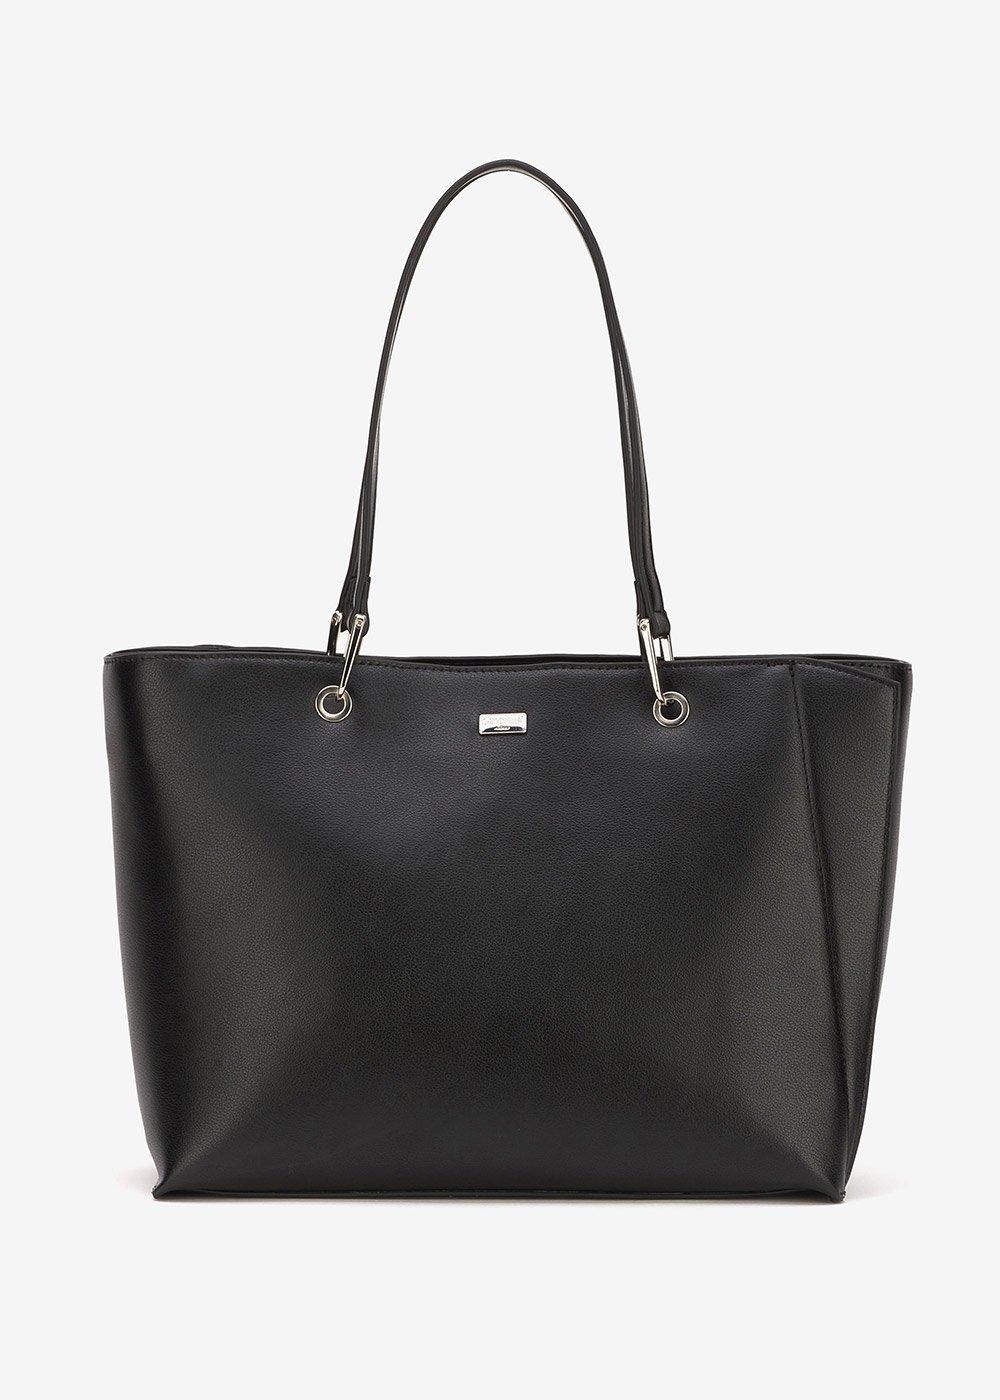 Shopping bag Blunt rigida - Black - Donna